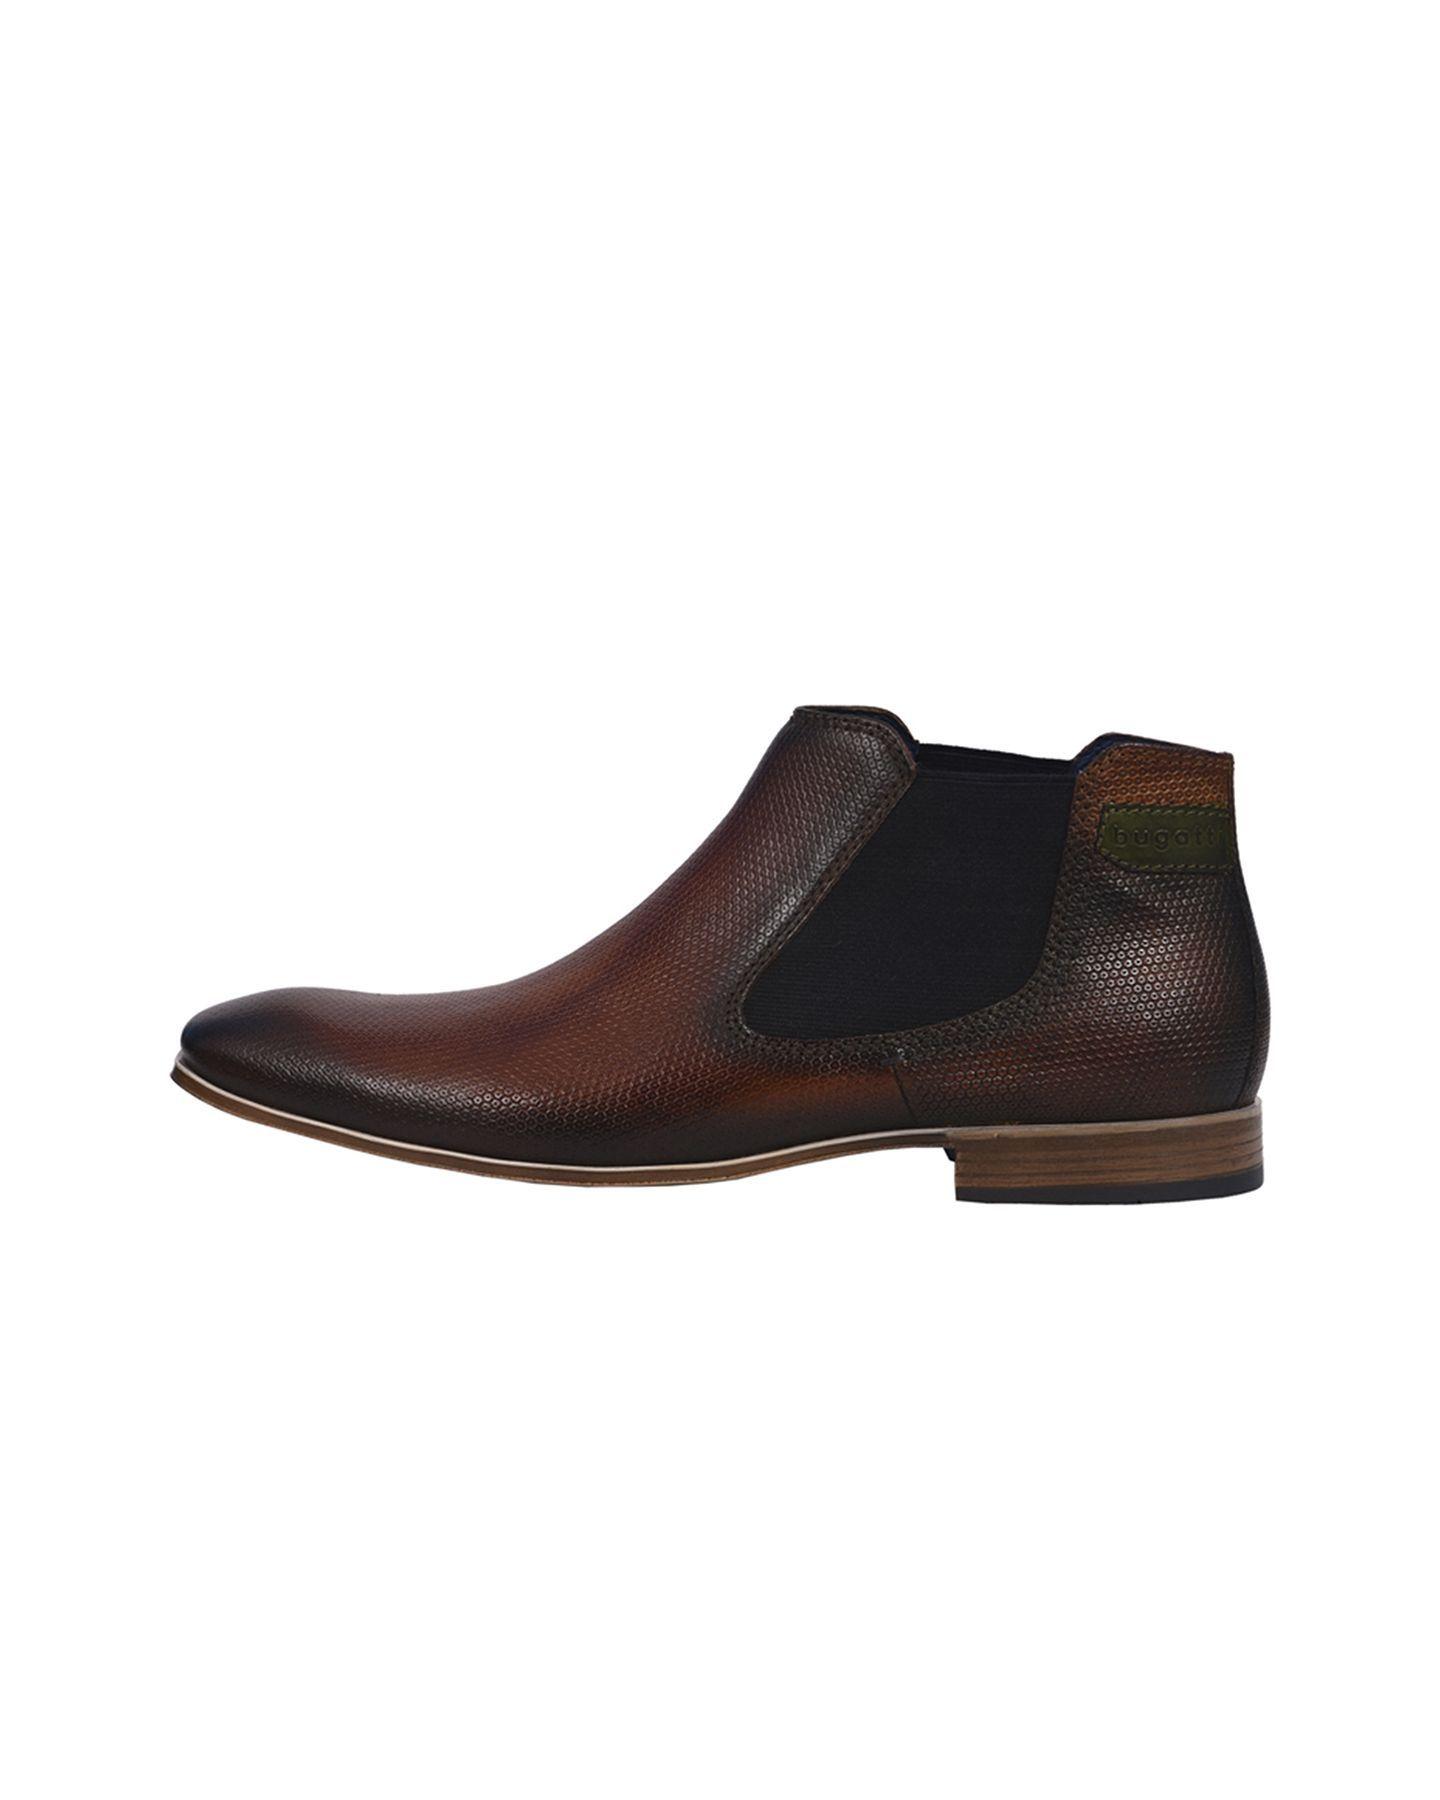 bugatti Chelsea boots in cognac in Größe 43